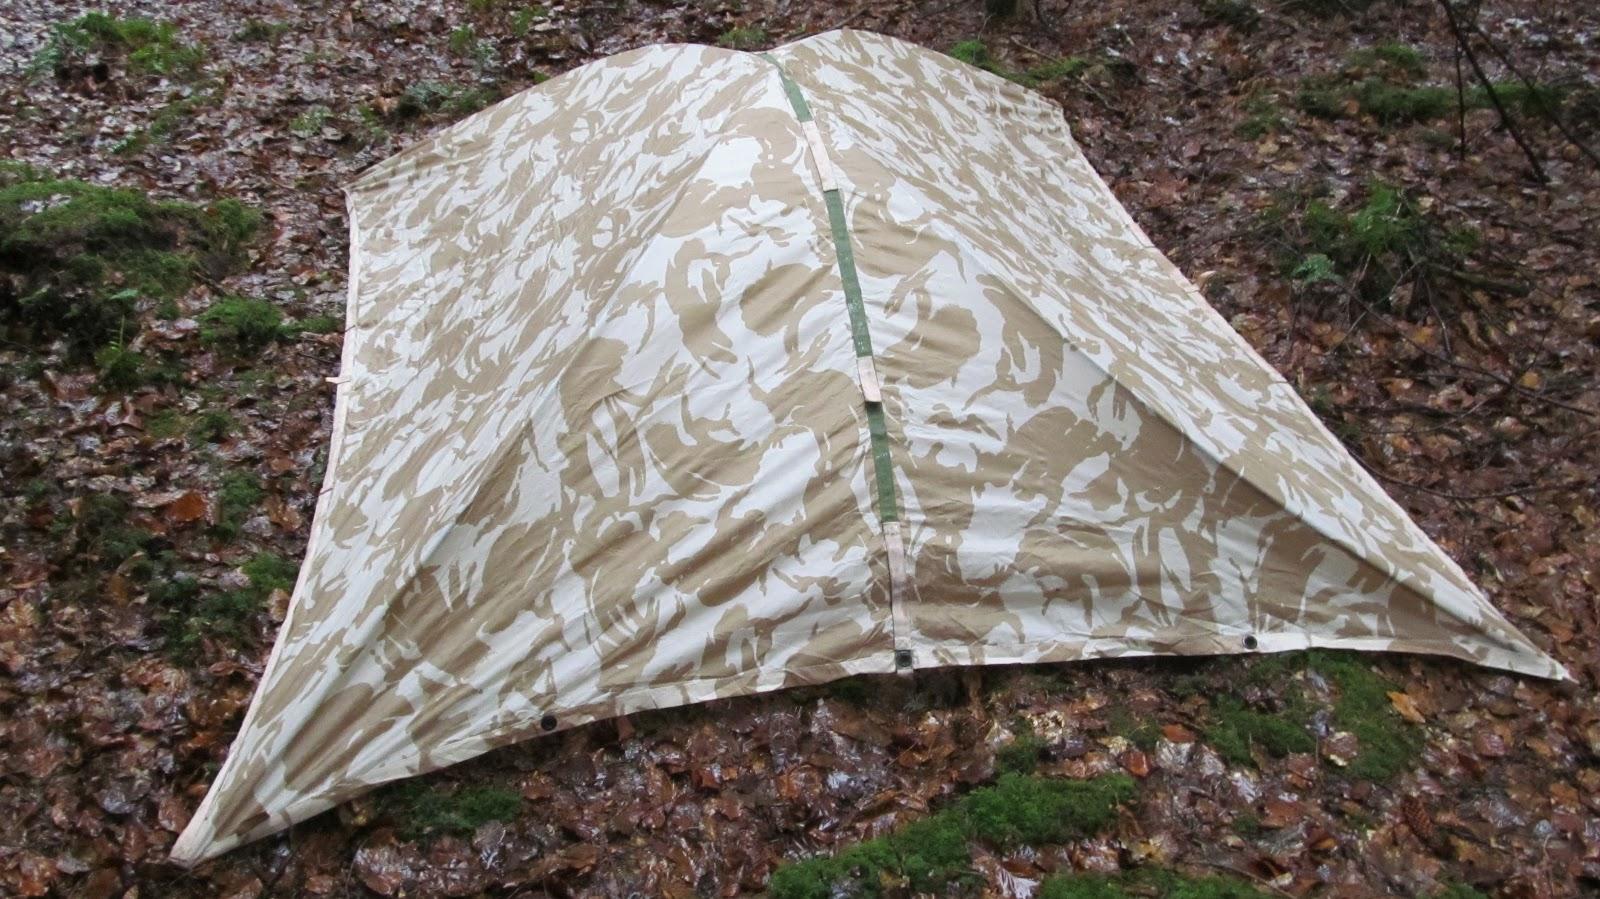 Tarp Tents Shelter : Buzzard bushcraft tarp tent